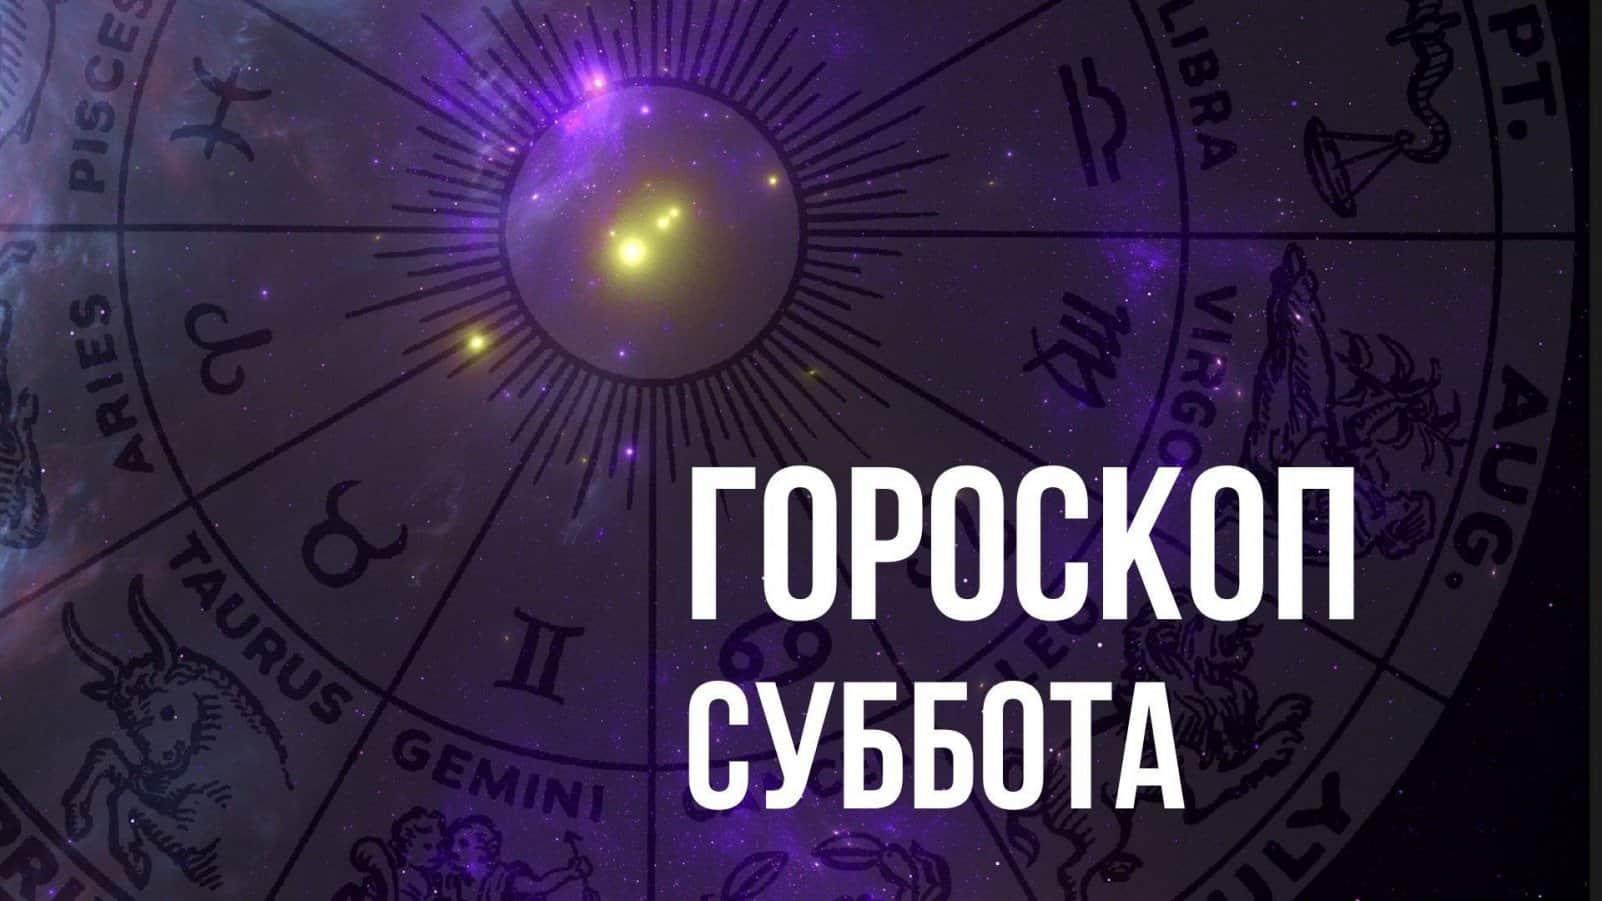 Гороскоп на субботу 13 марта для каждого знака Зодиака